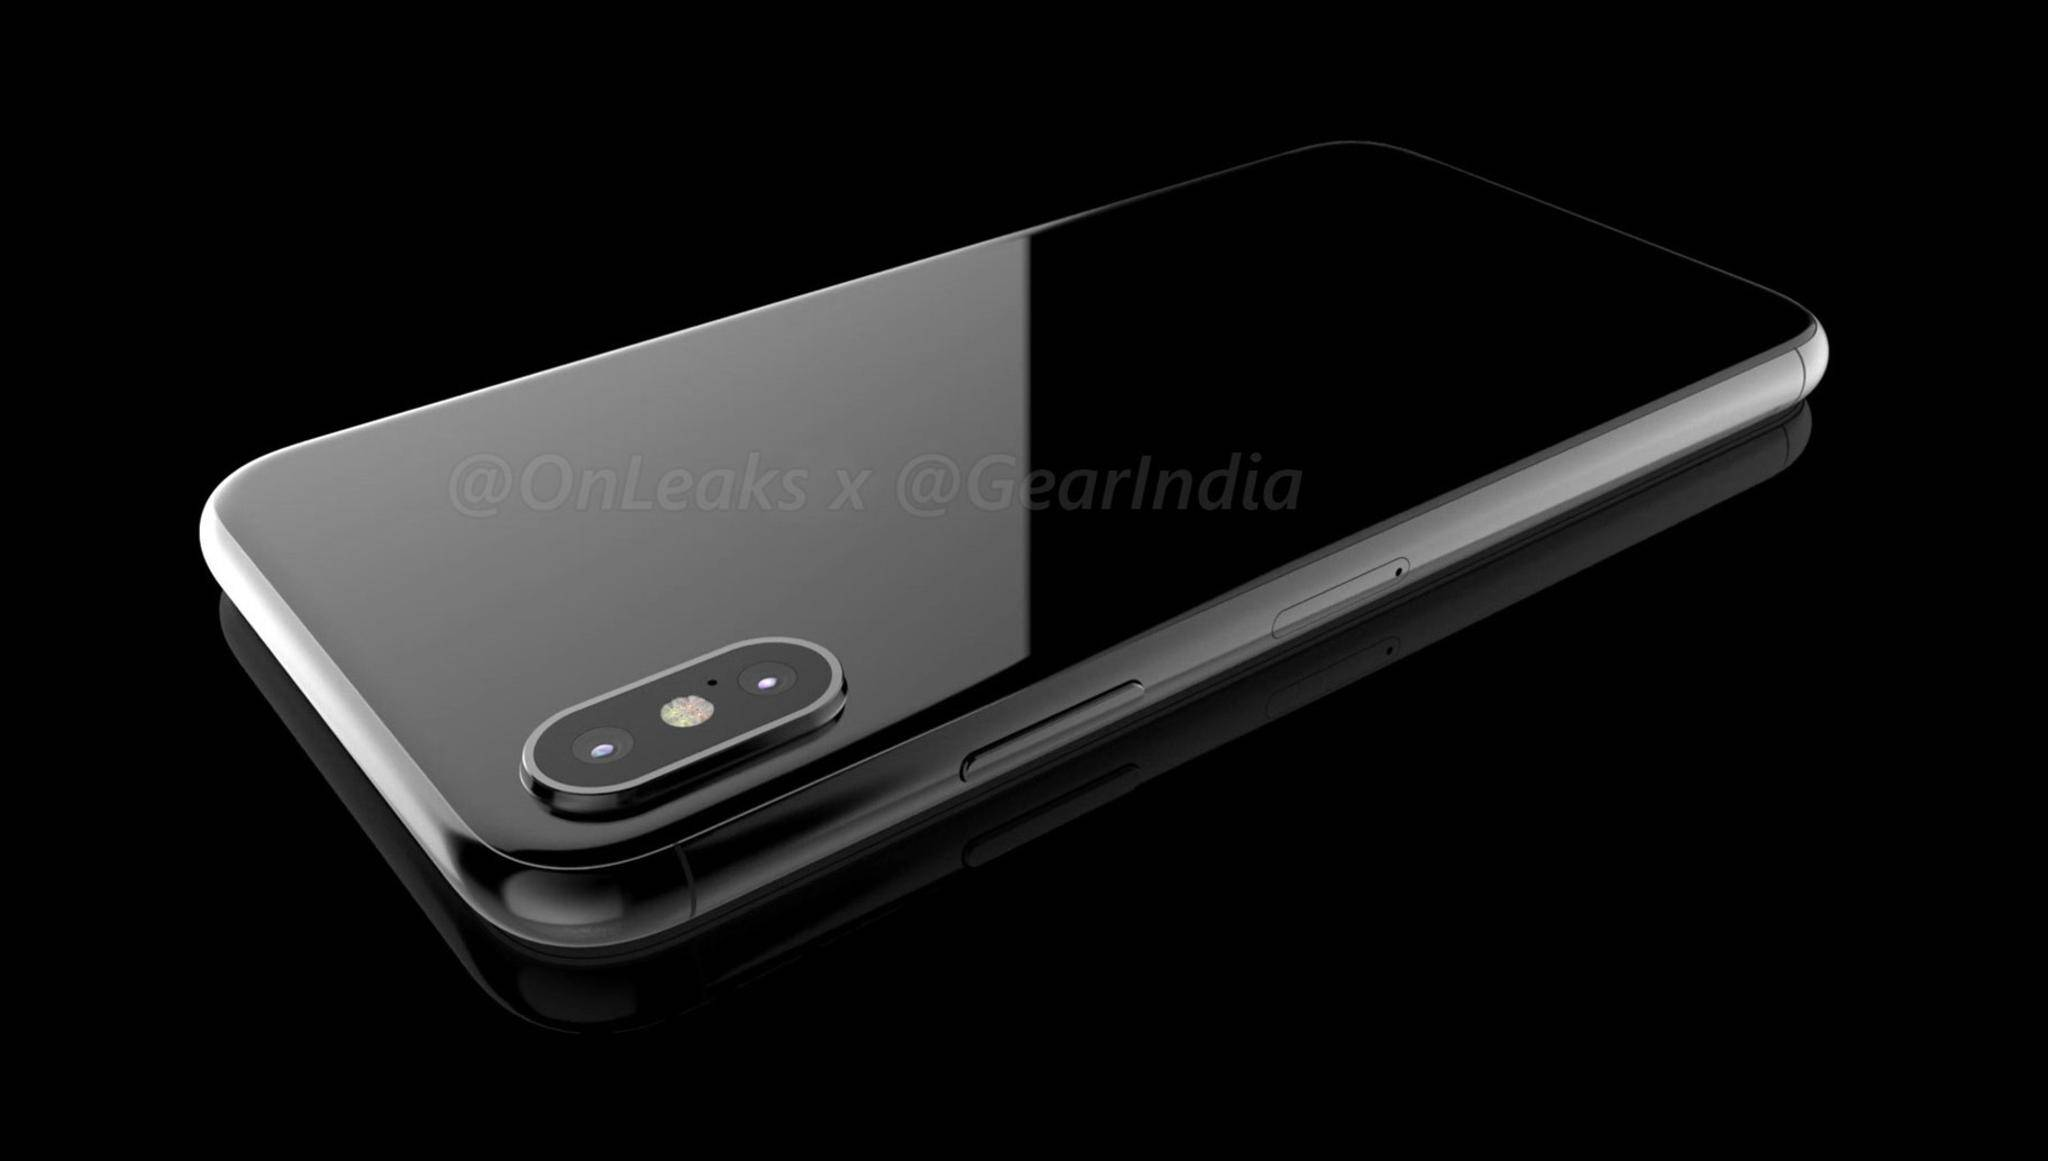 IPhone: Meistverkauftes Smartphone im 1. Quartal 2017